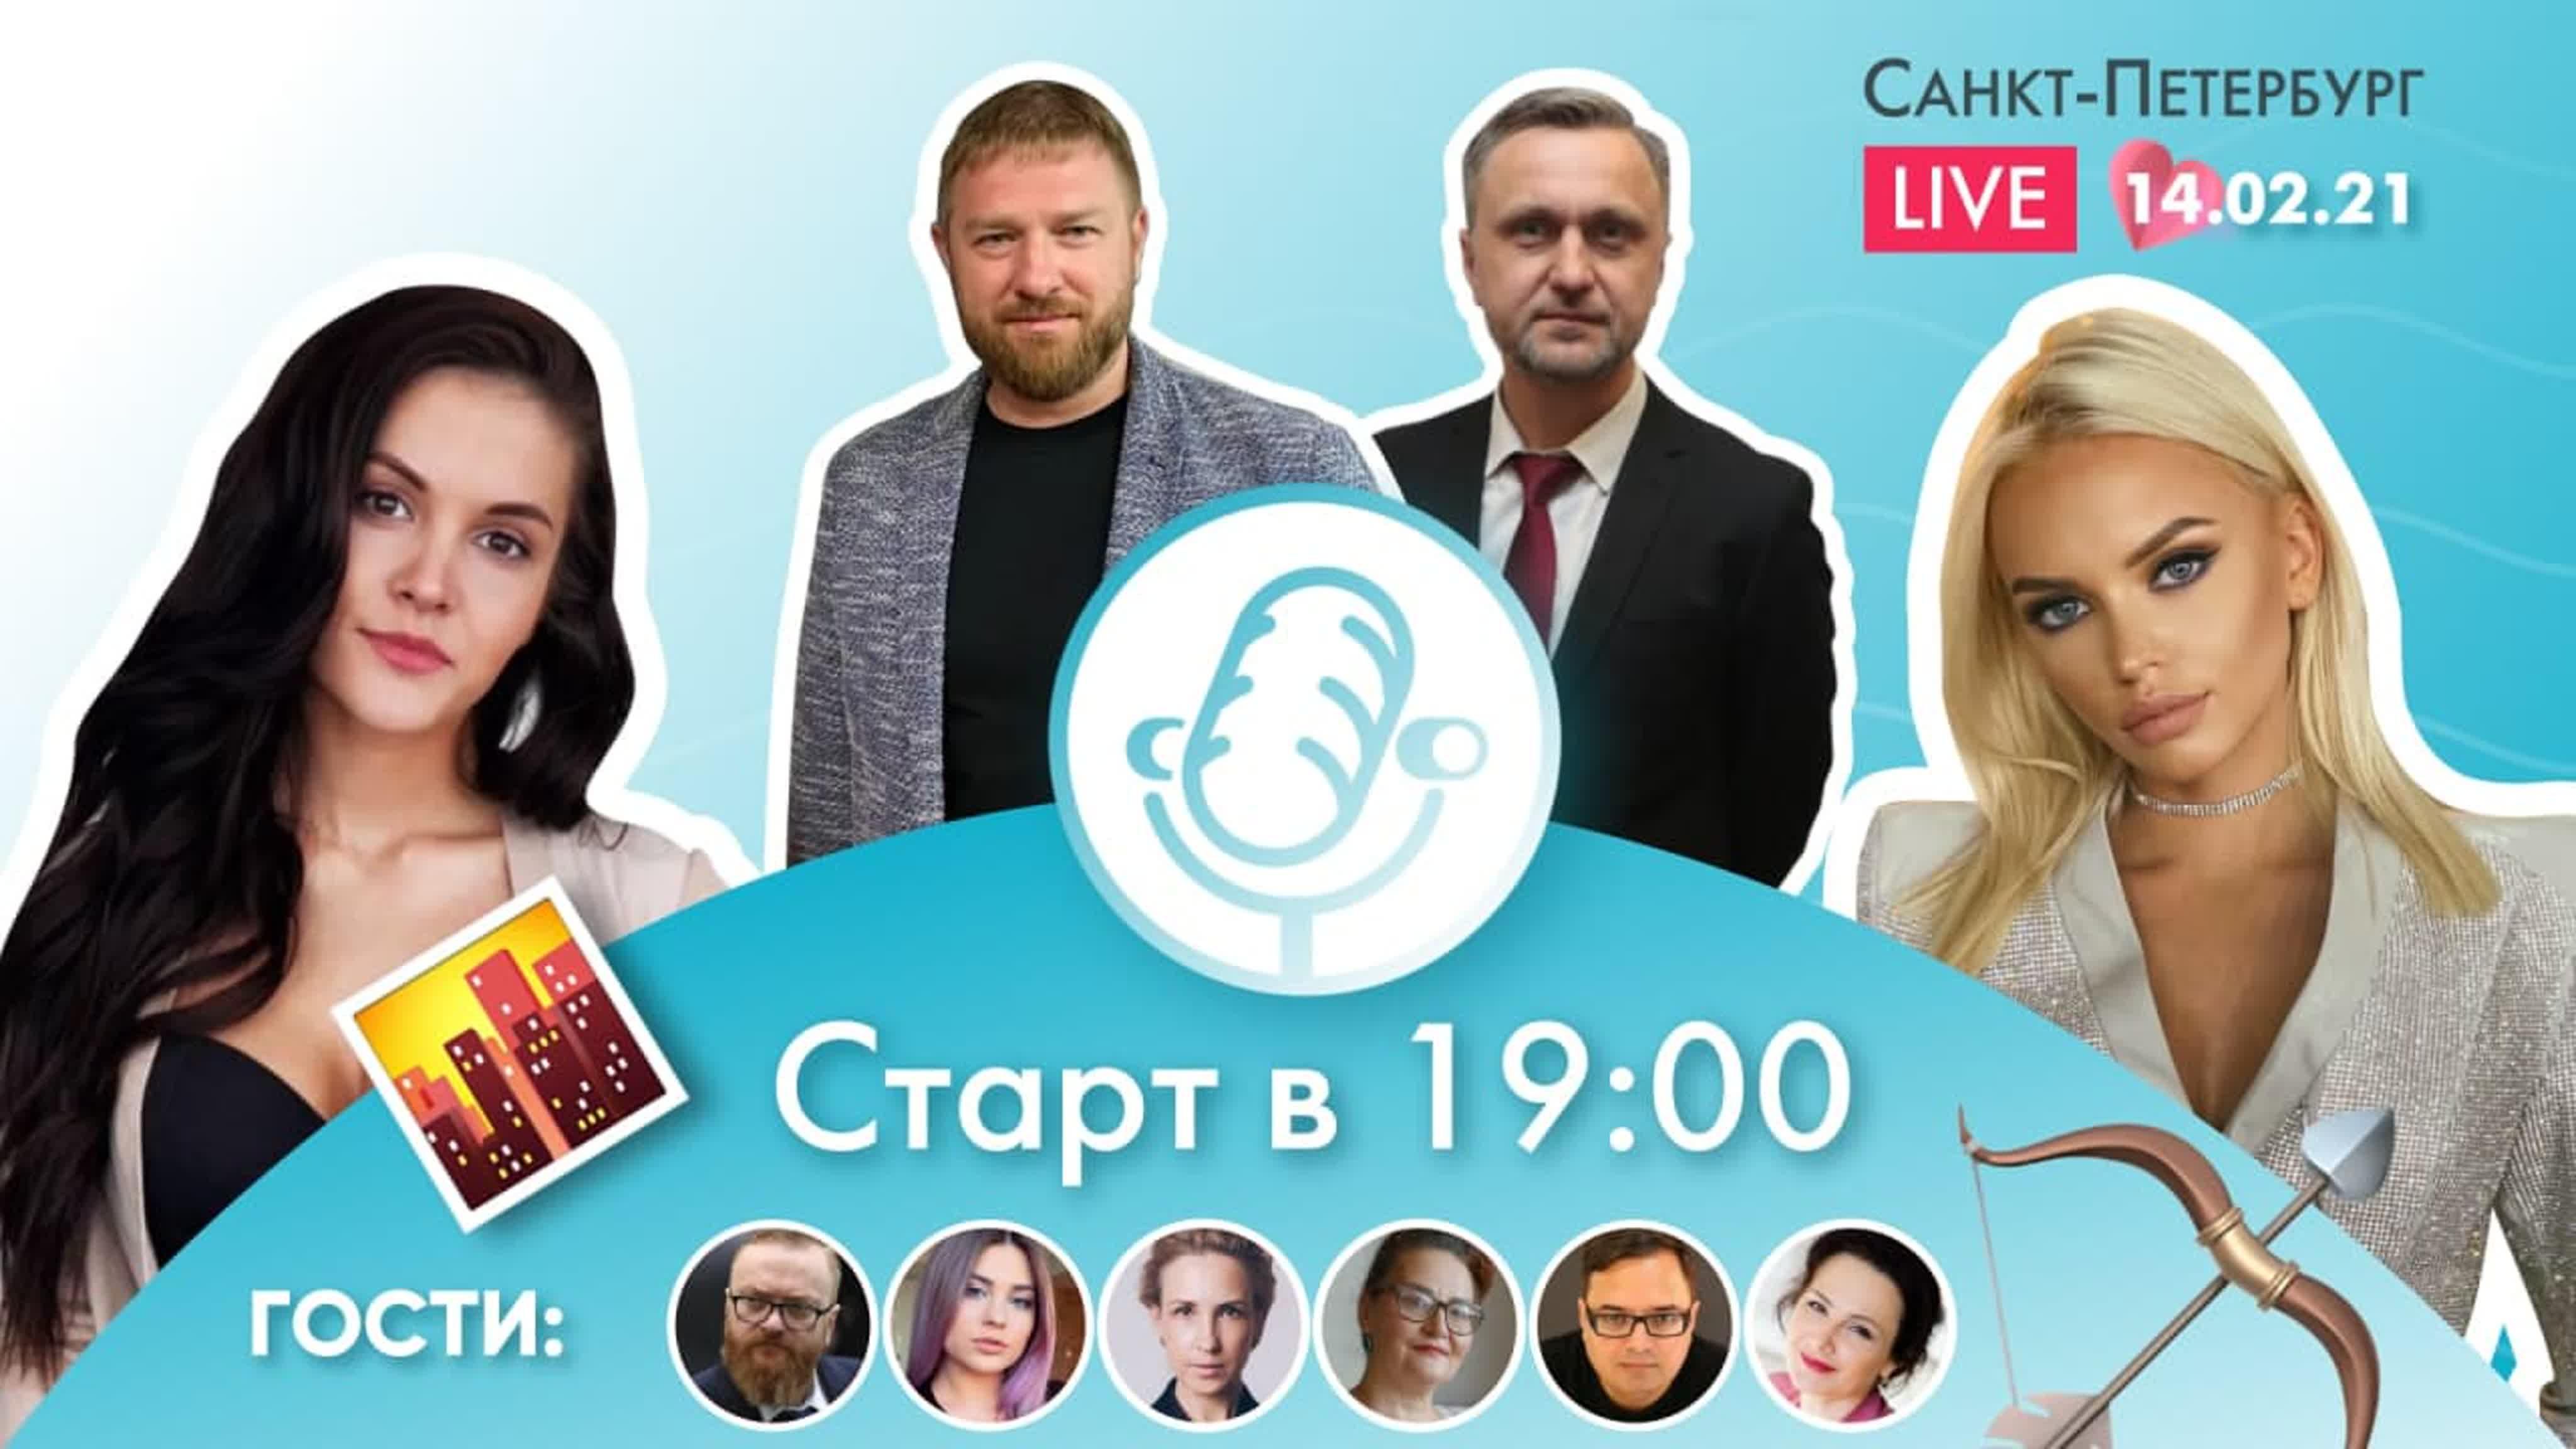 Санкт-Петербург LIVE.